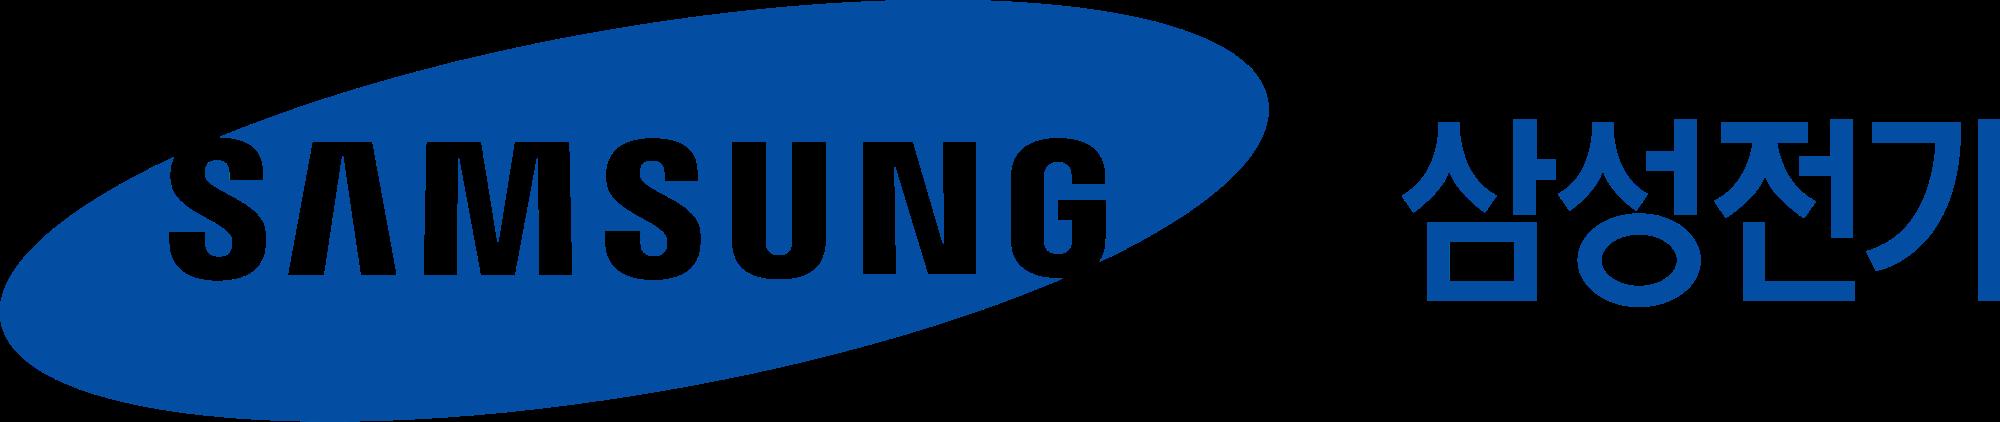 Samsung Logo Transparent Background | www.pixshark.com ...